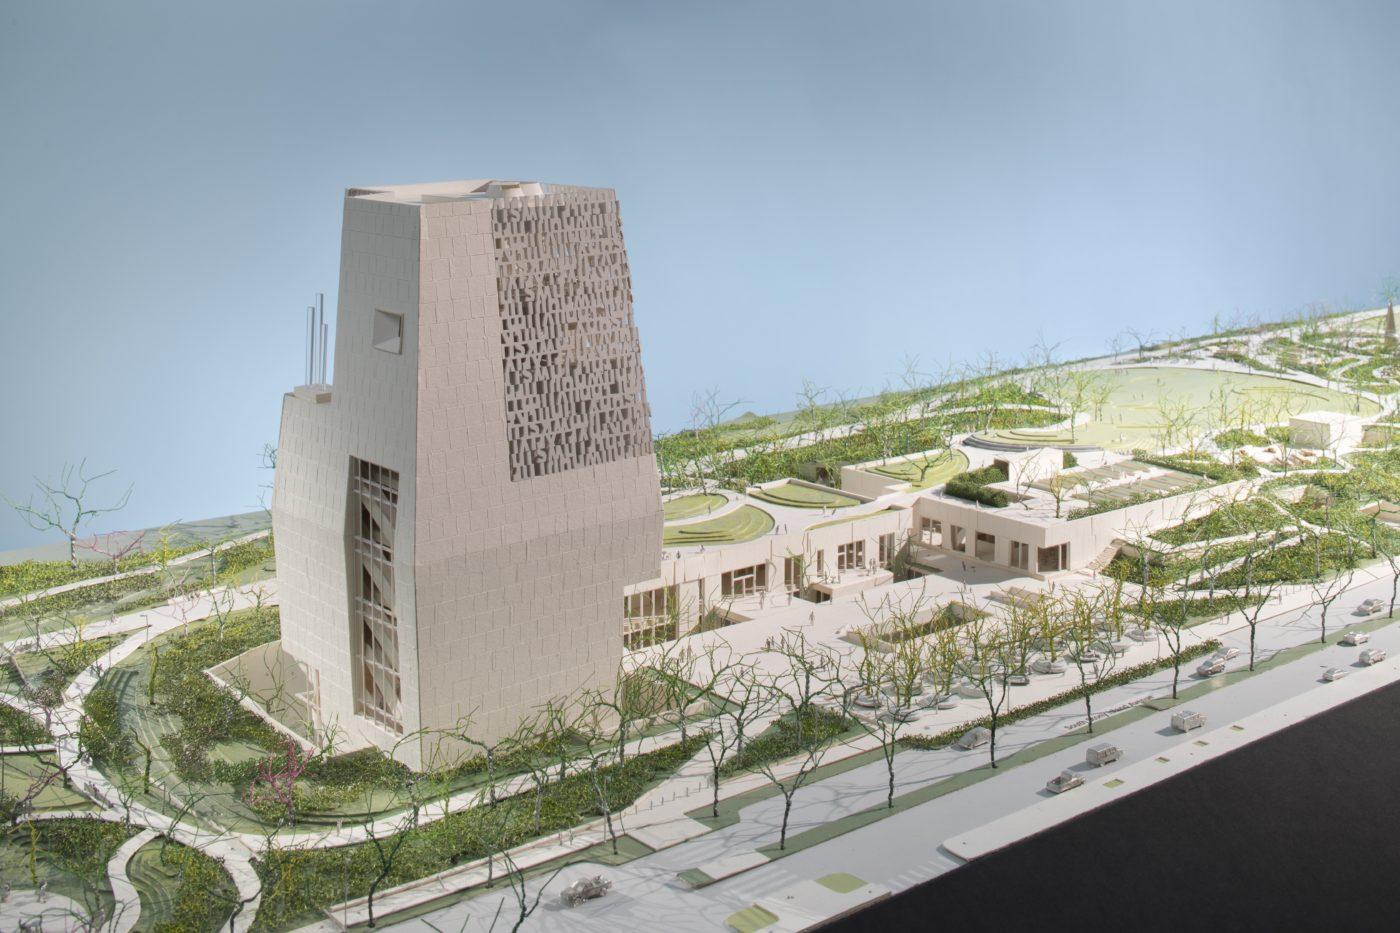 Obama Center Chicago